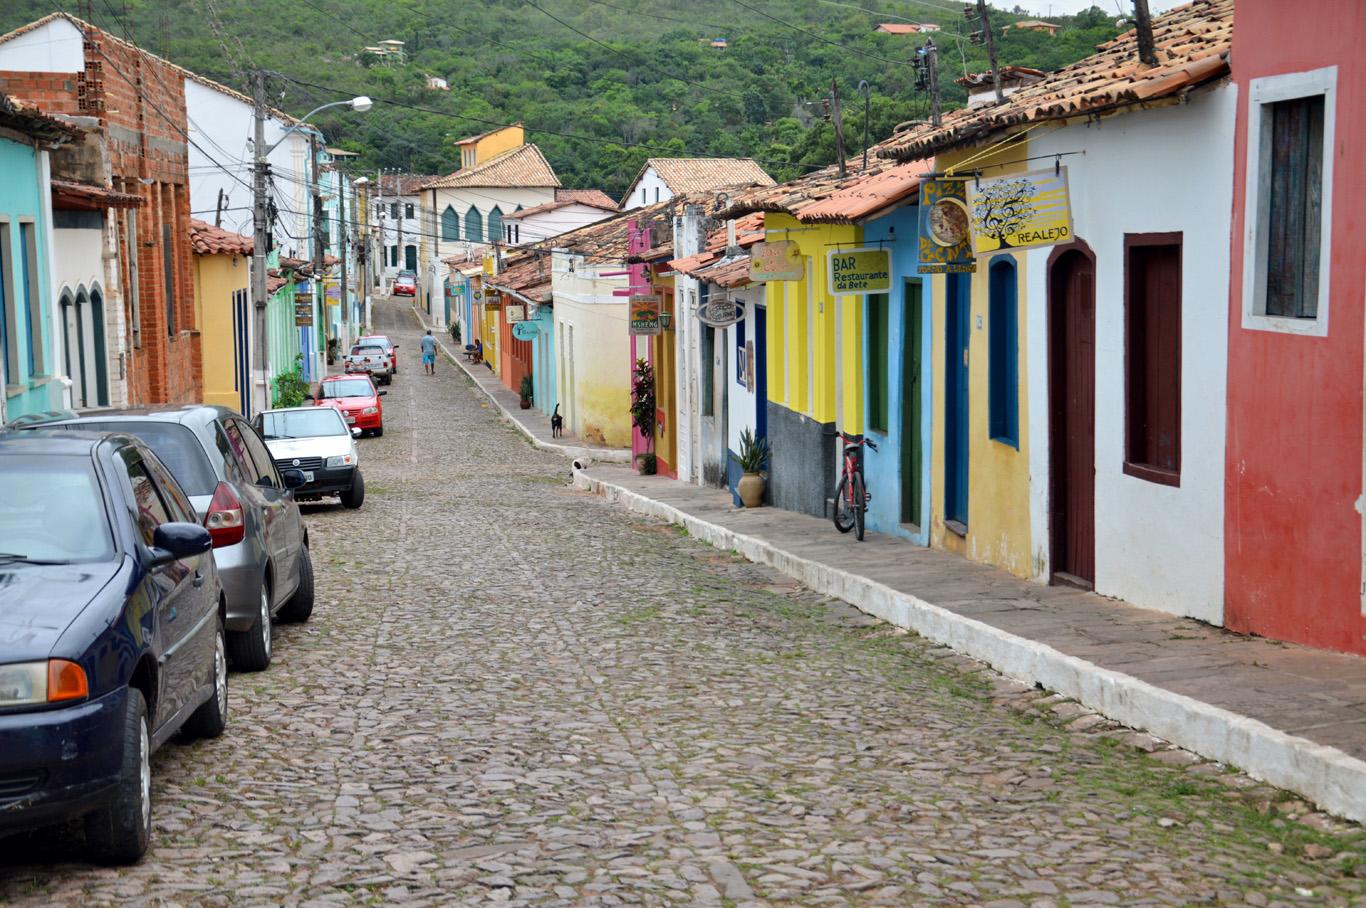 Colorful cobblestone street in Lençois